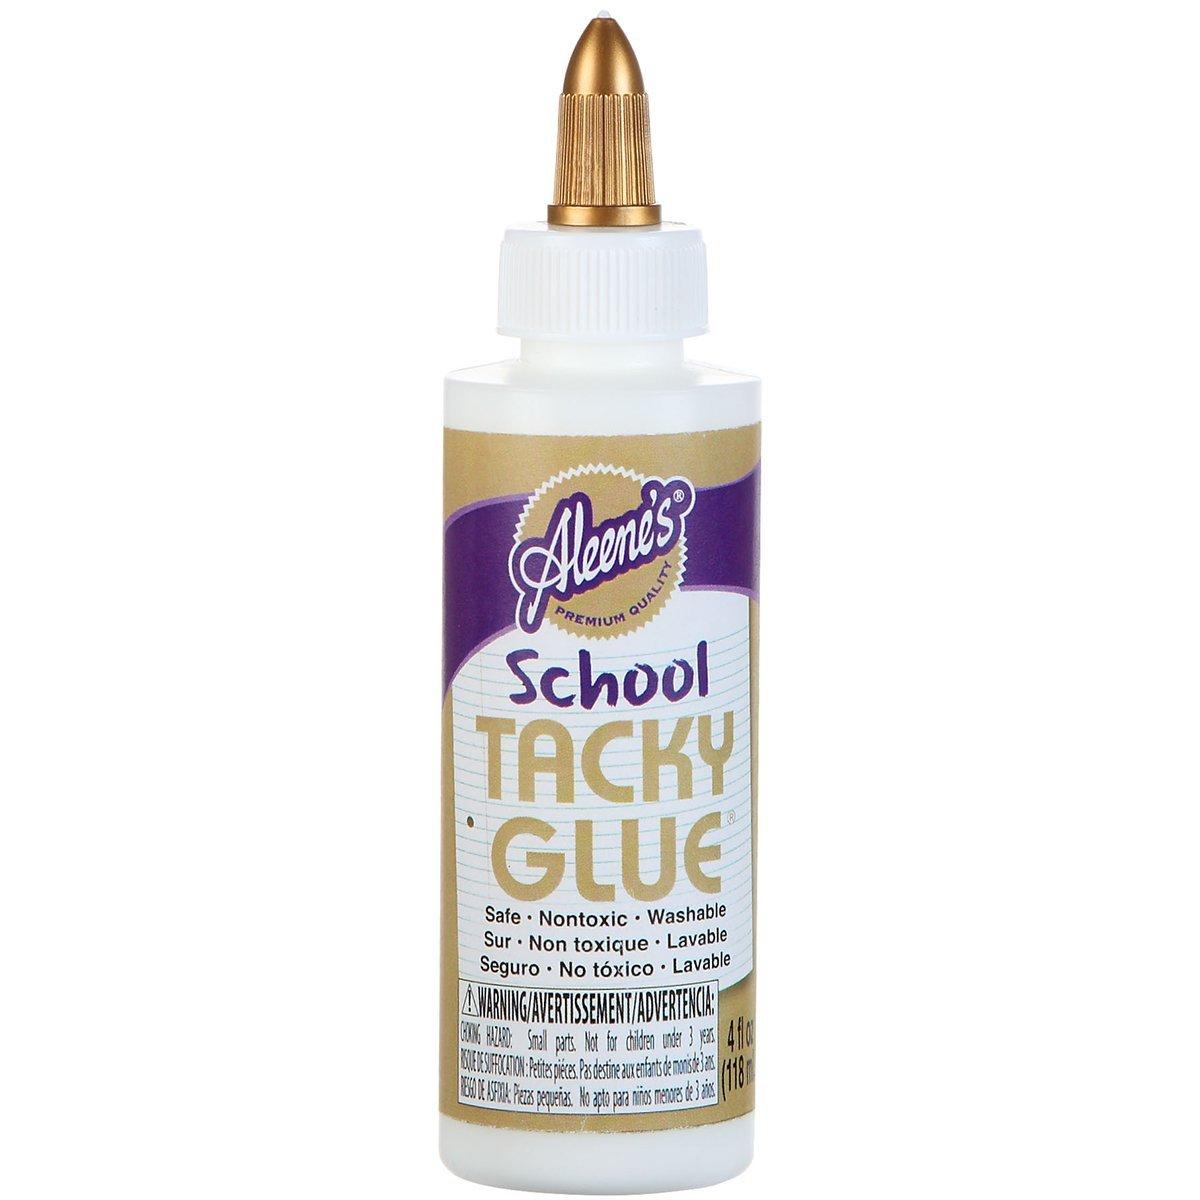 Aleene's School Tacky Glue, 4-Ounce